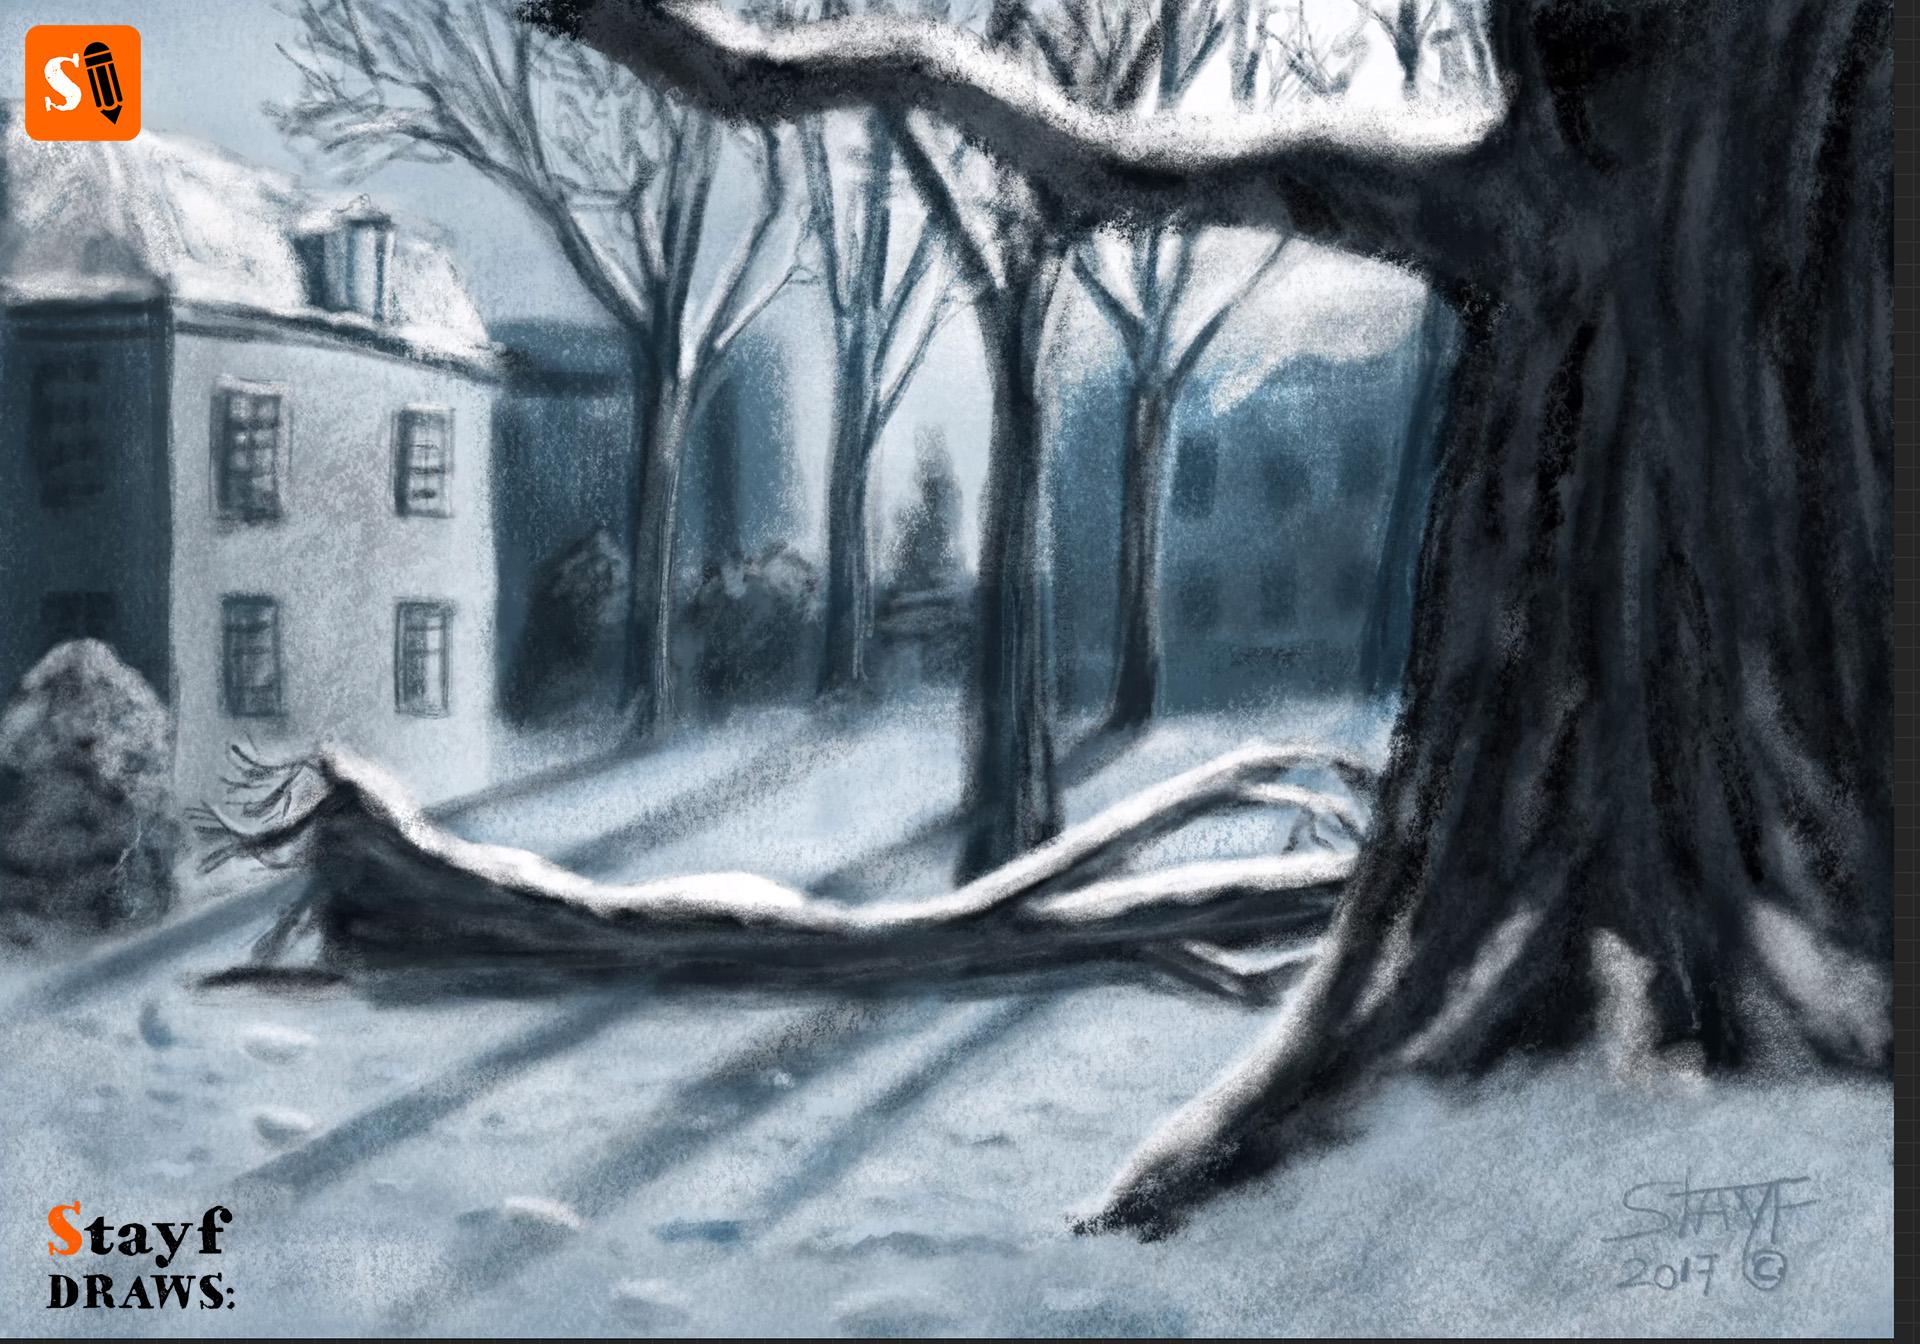 StayfDraws-Procreate-Pastels-Winterlandscape4